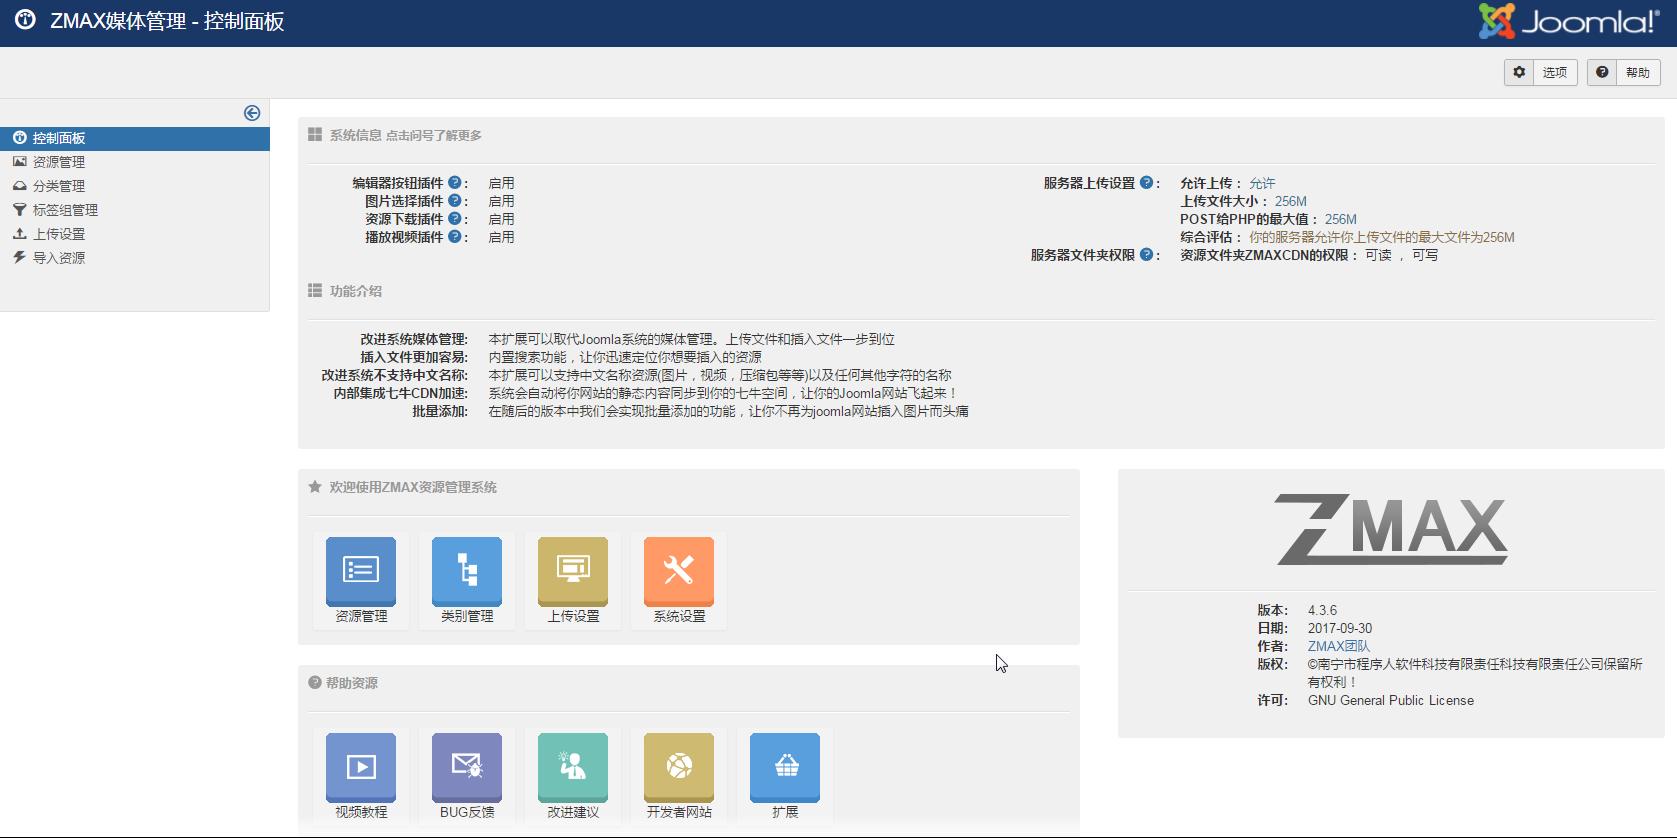 joomla媒体管理组件后台控制界面.png